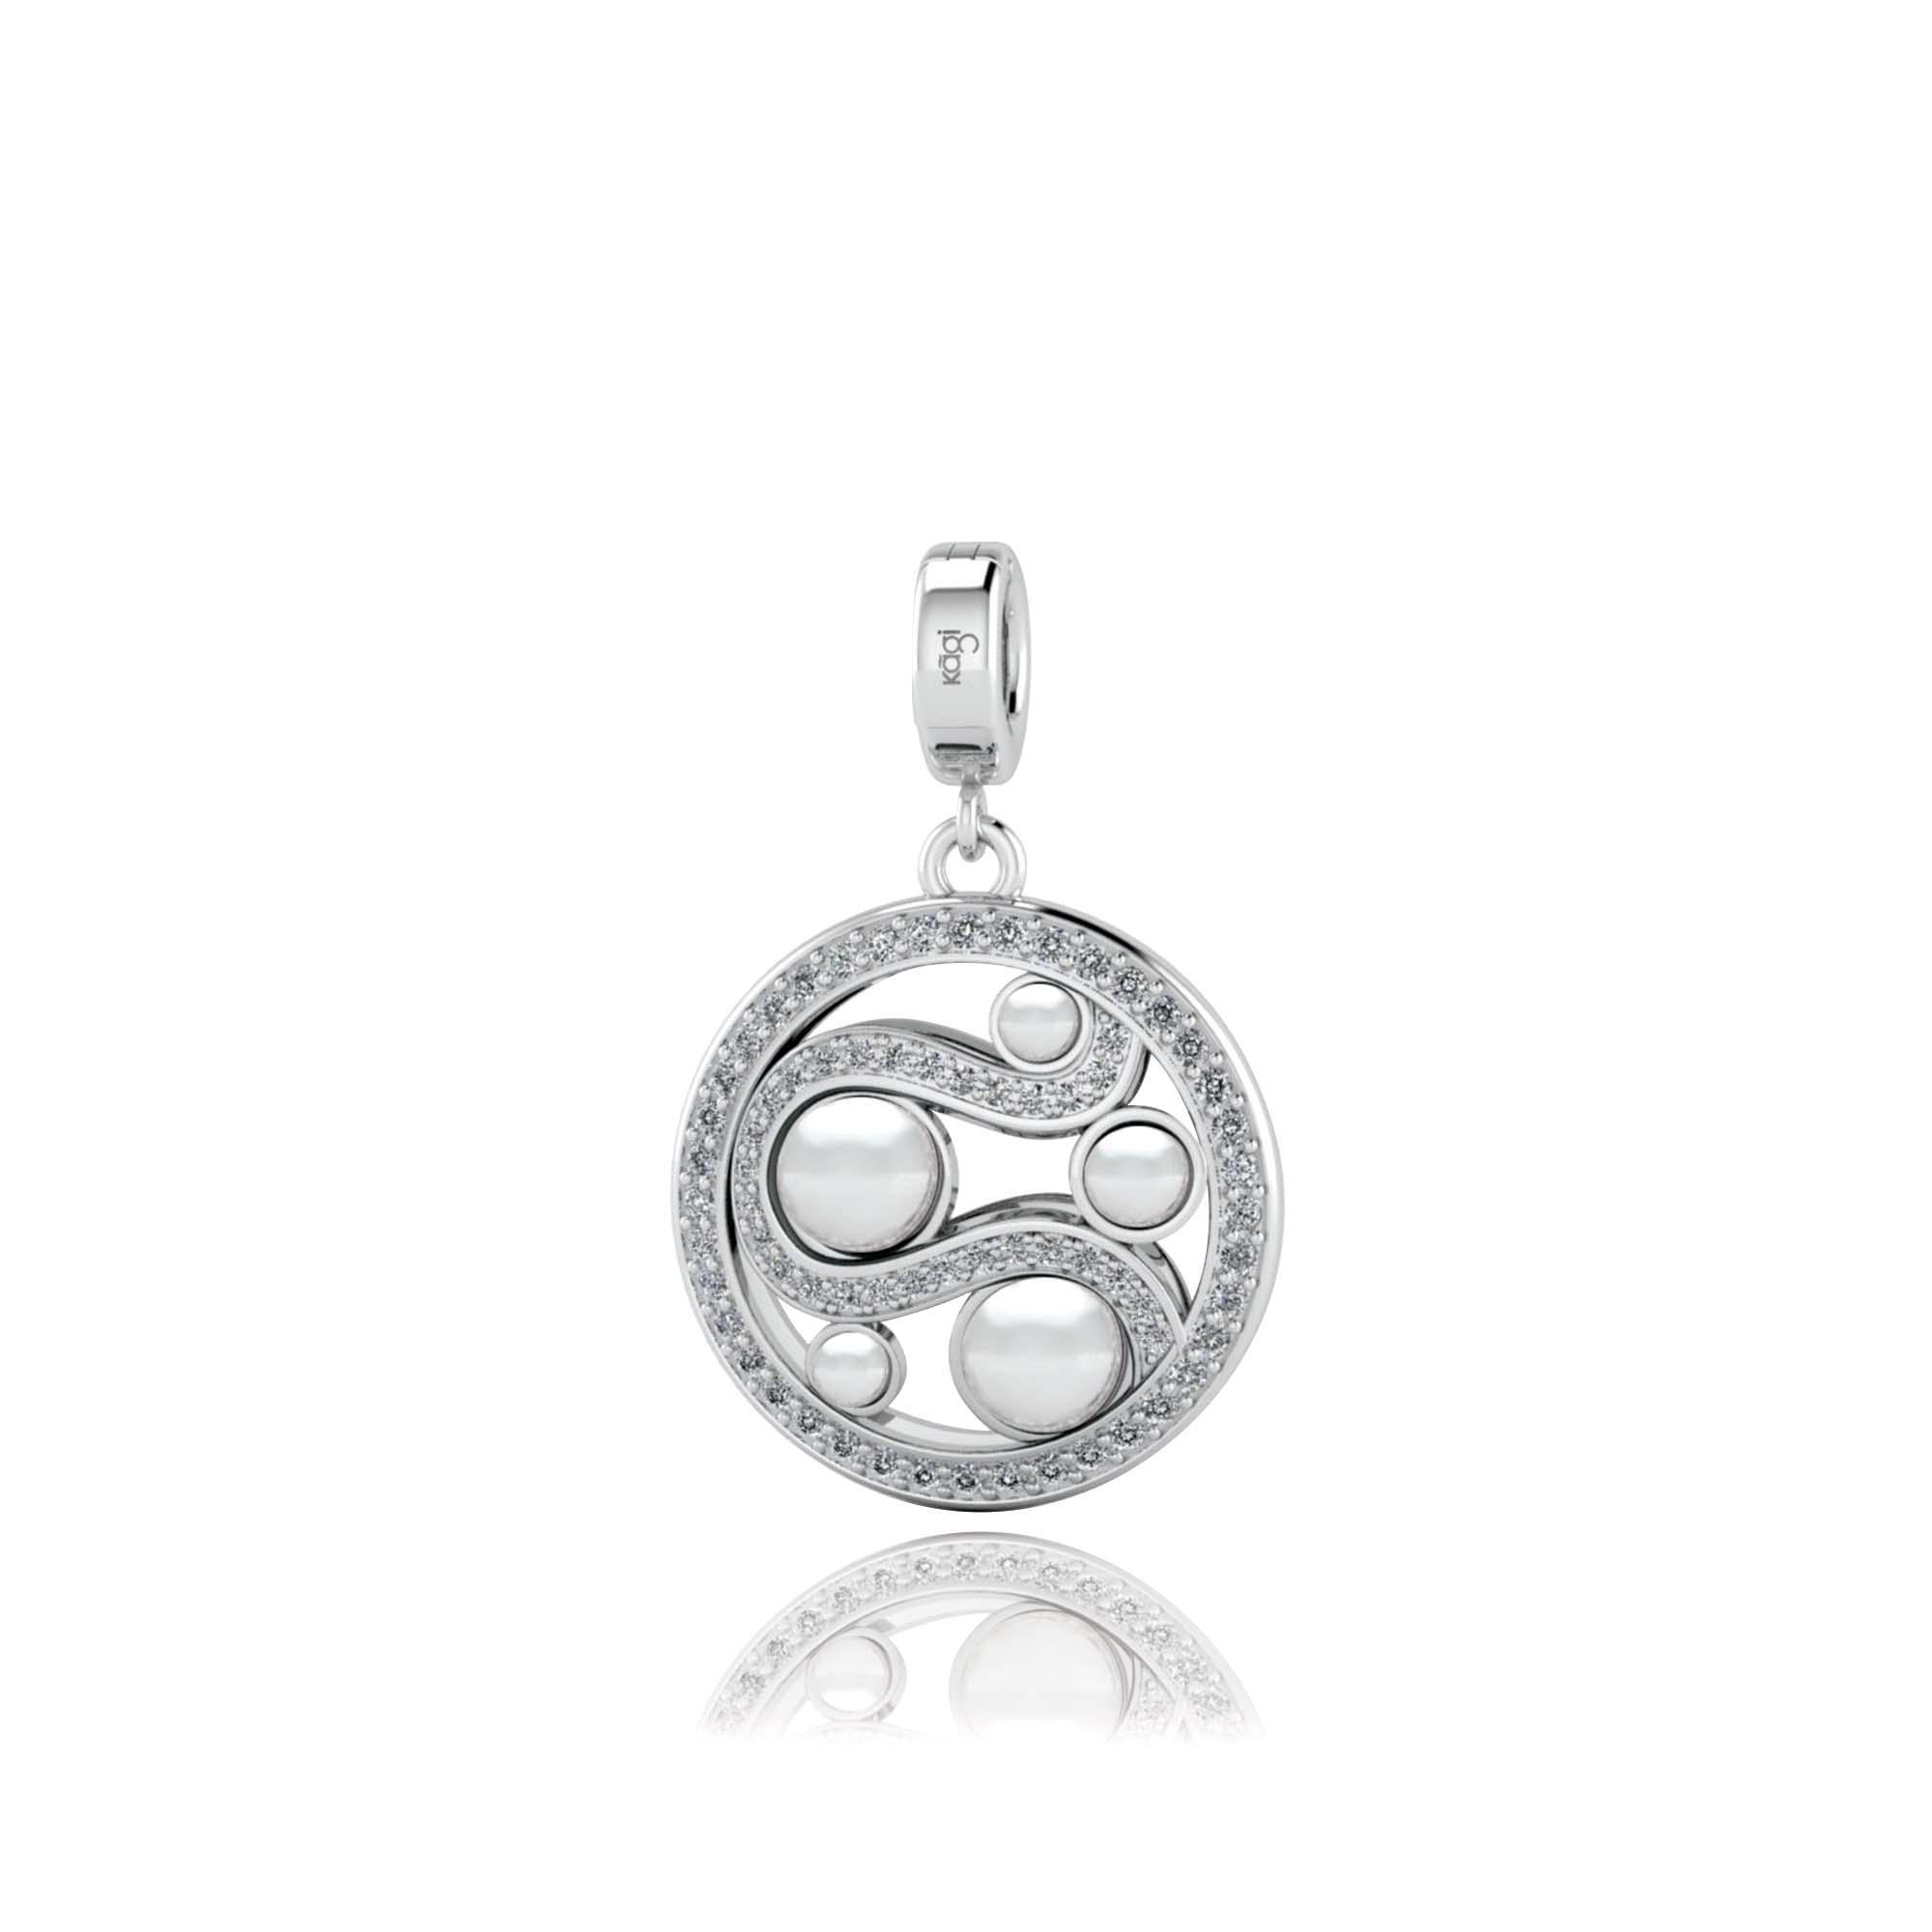 Kagi Mystic Pearl Small Pendant White Side $149 www.kagi.net